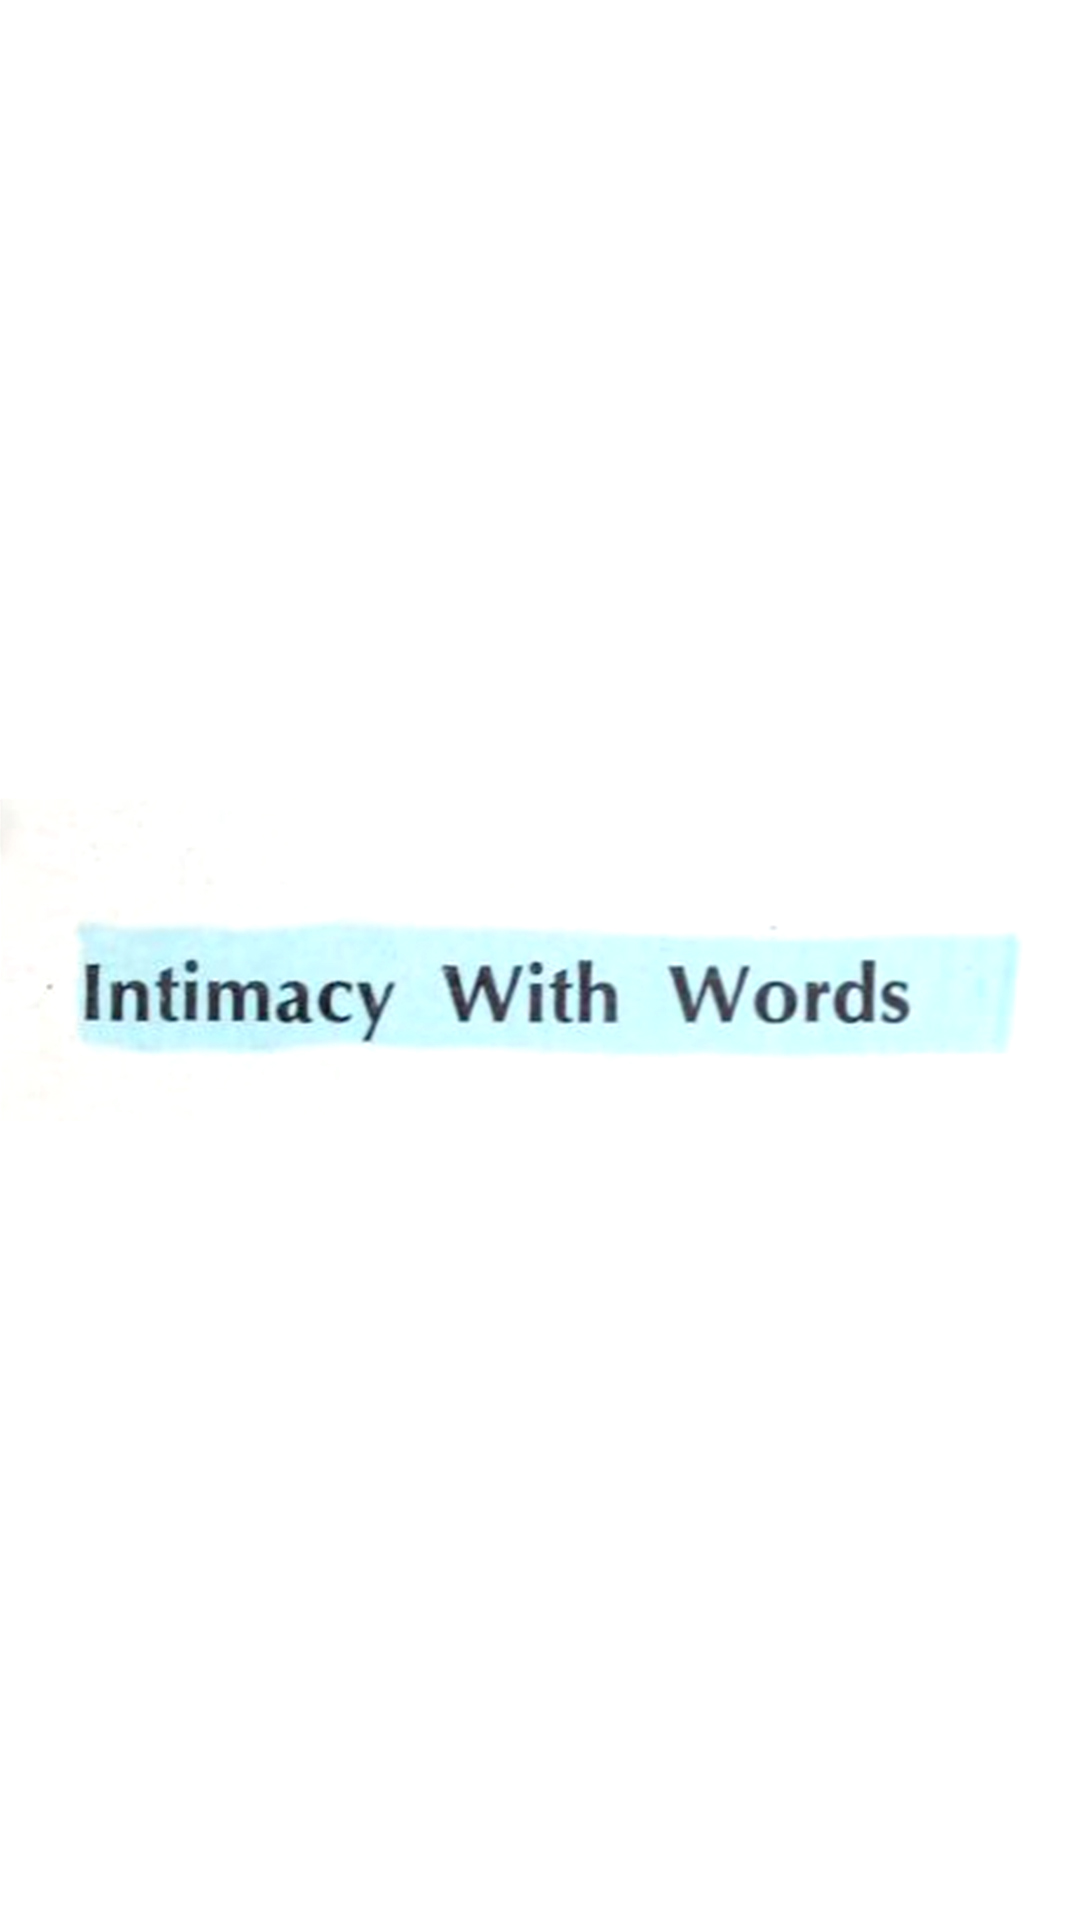 intimacywithwords.jpg